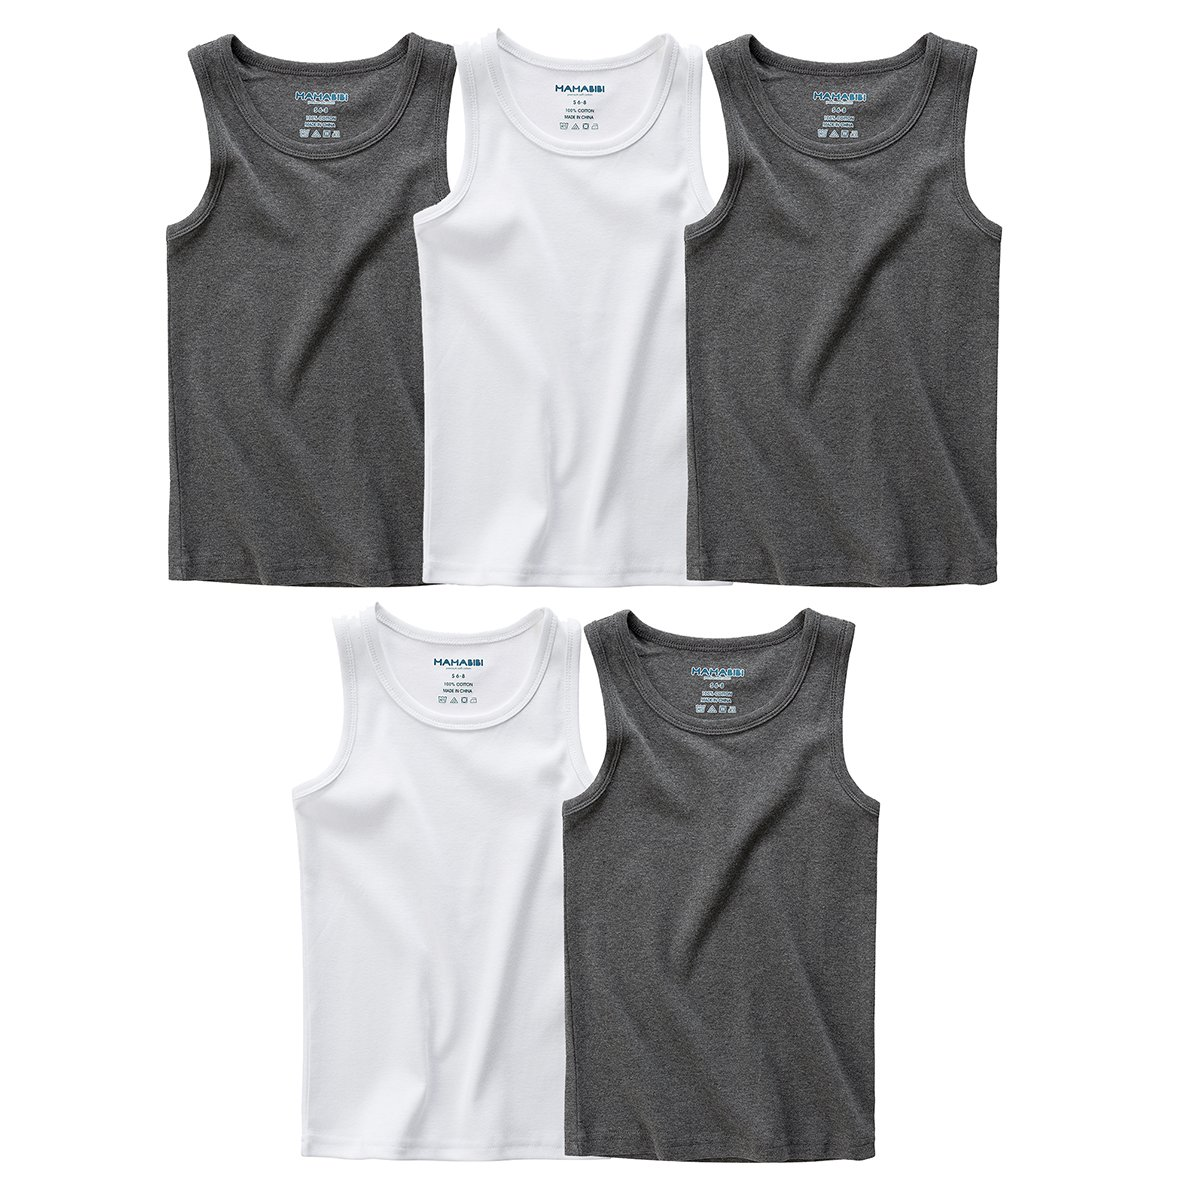 MAMABIBI Little Boys Undershirts Round Neck 100% Cotton Sleeveless T-Shirt 5 Pack